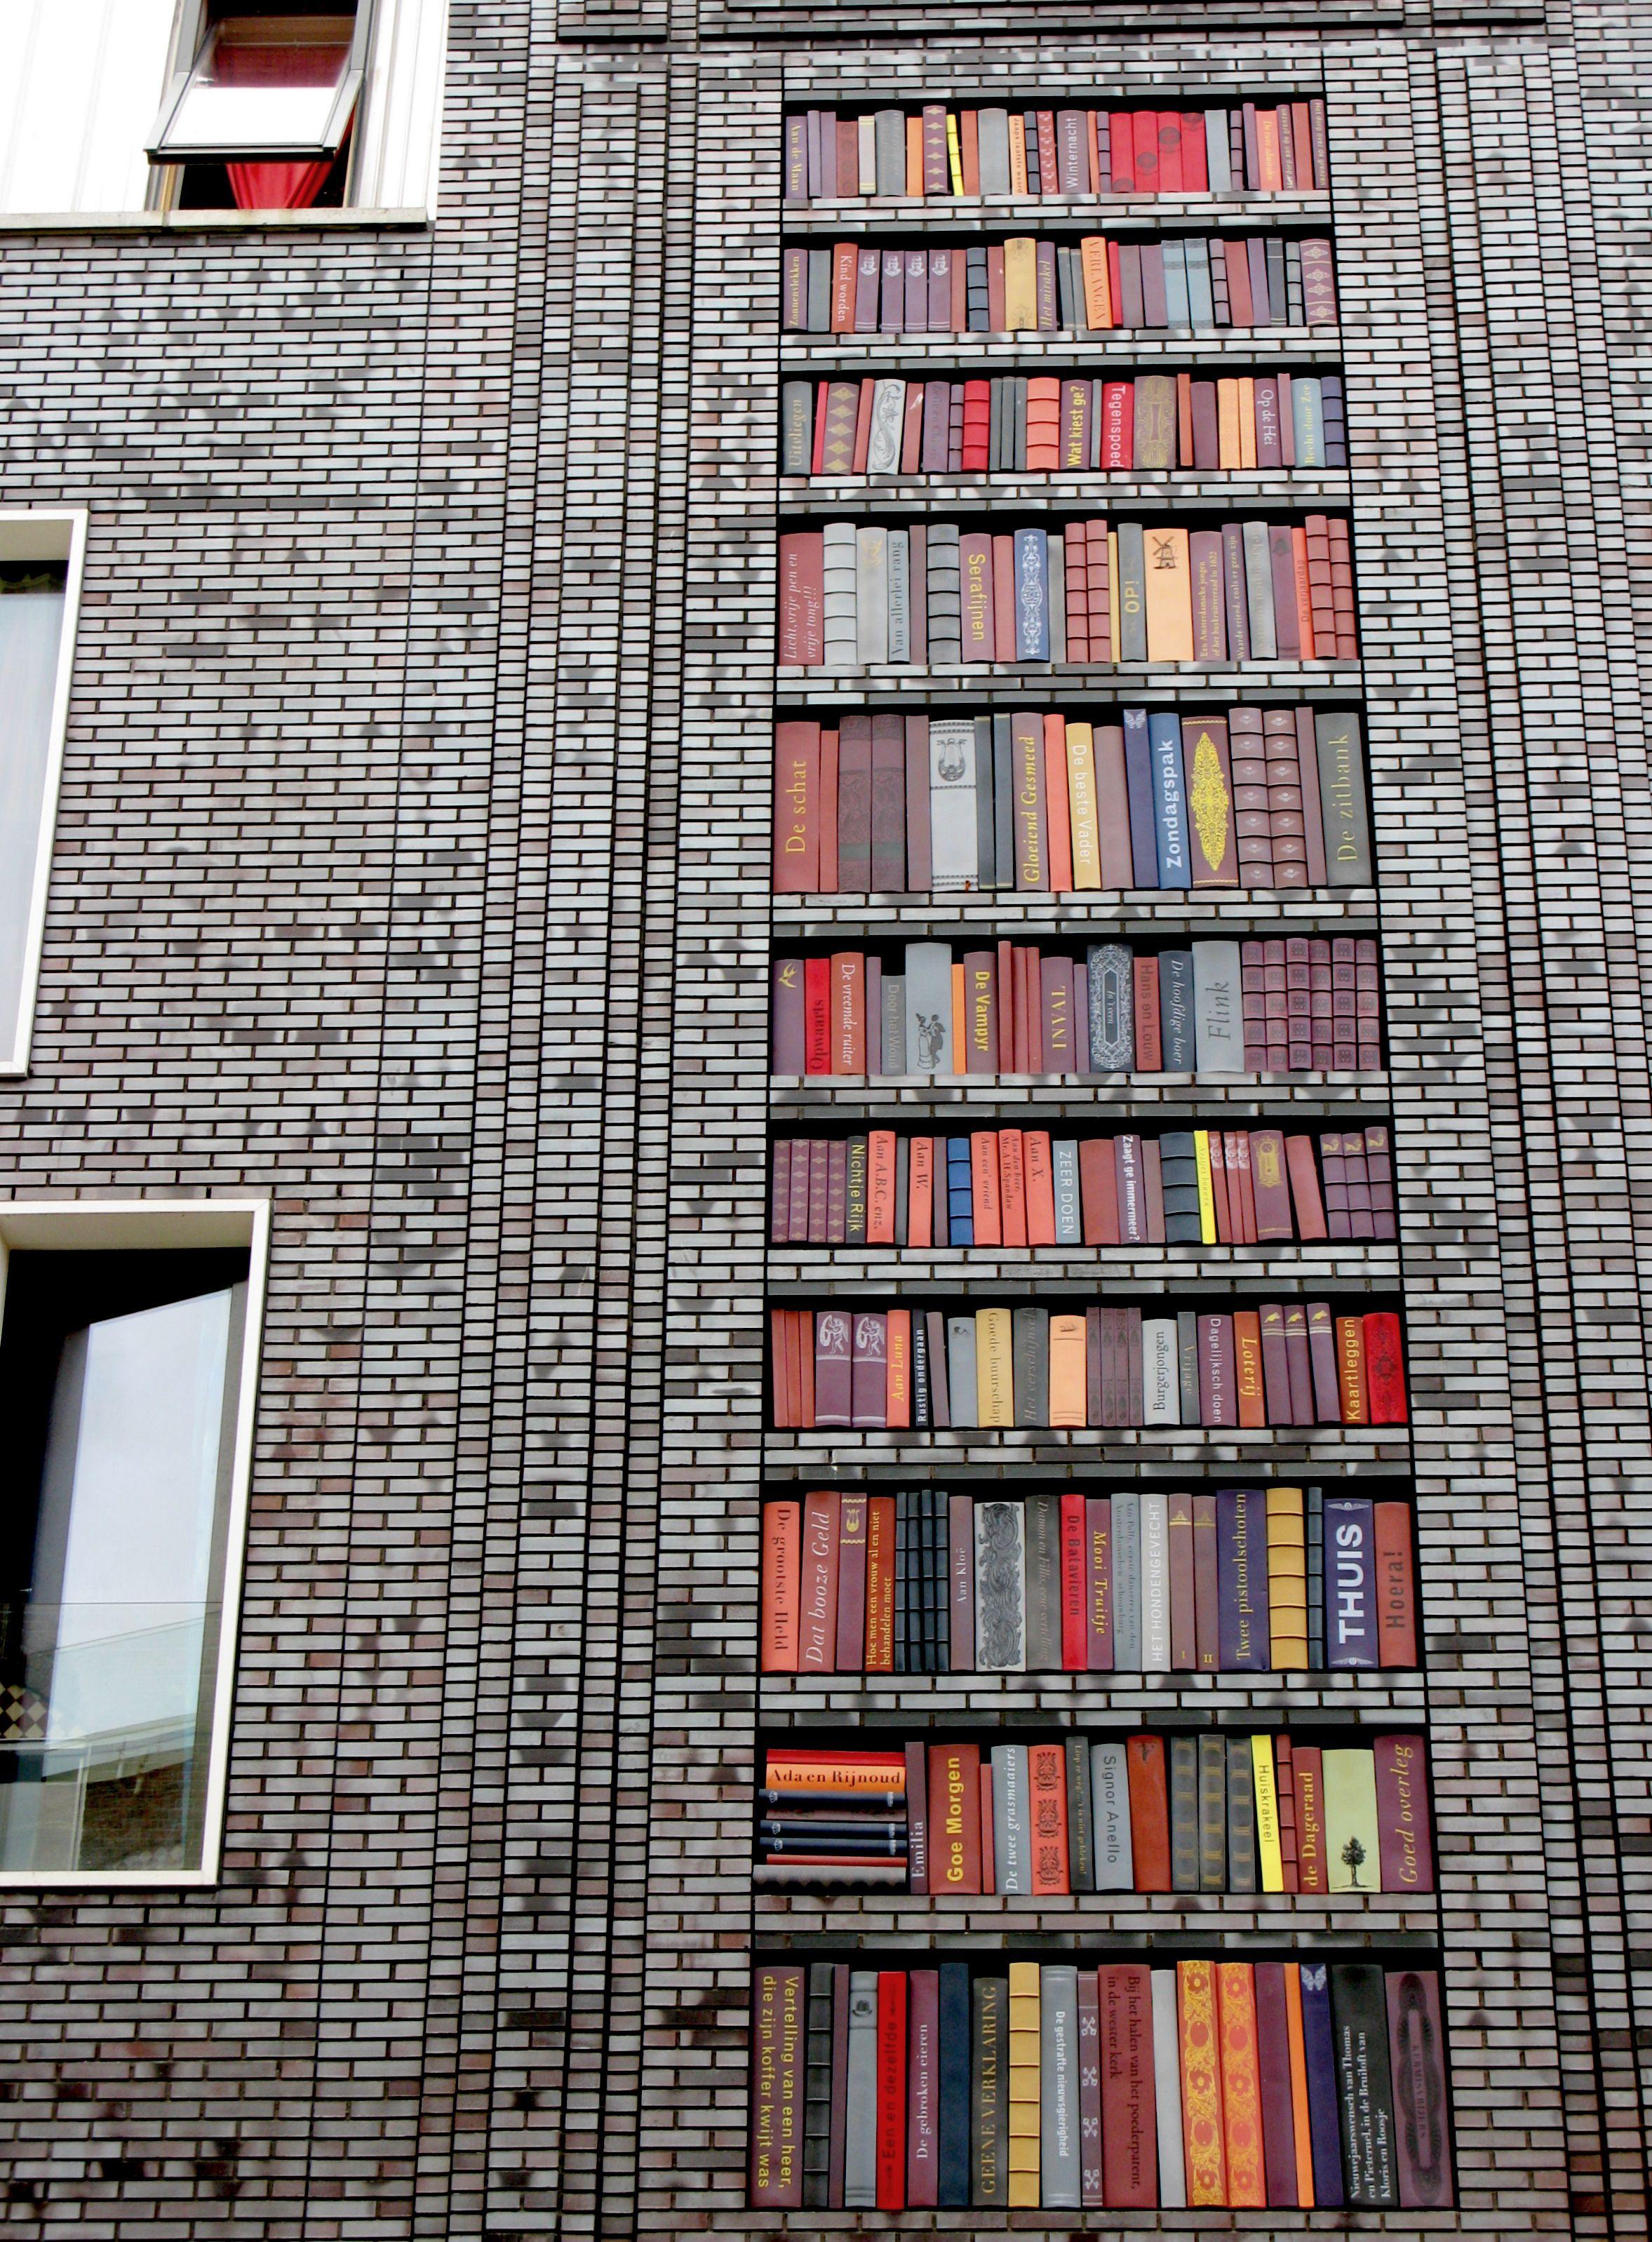 Building in Amsterdam West, designed with ceramic books